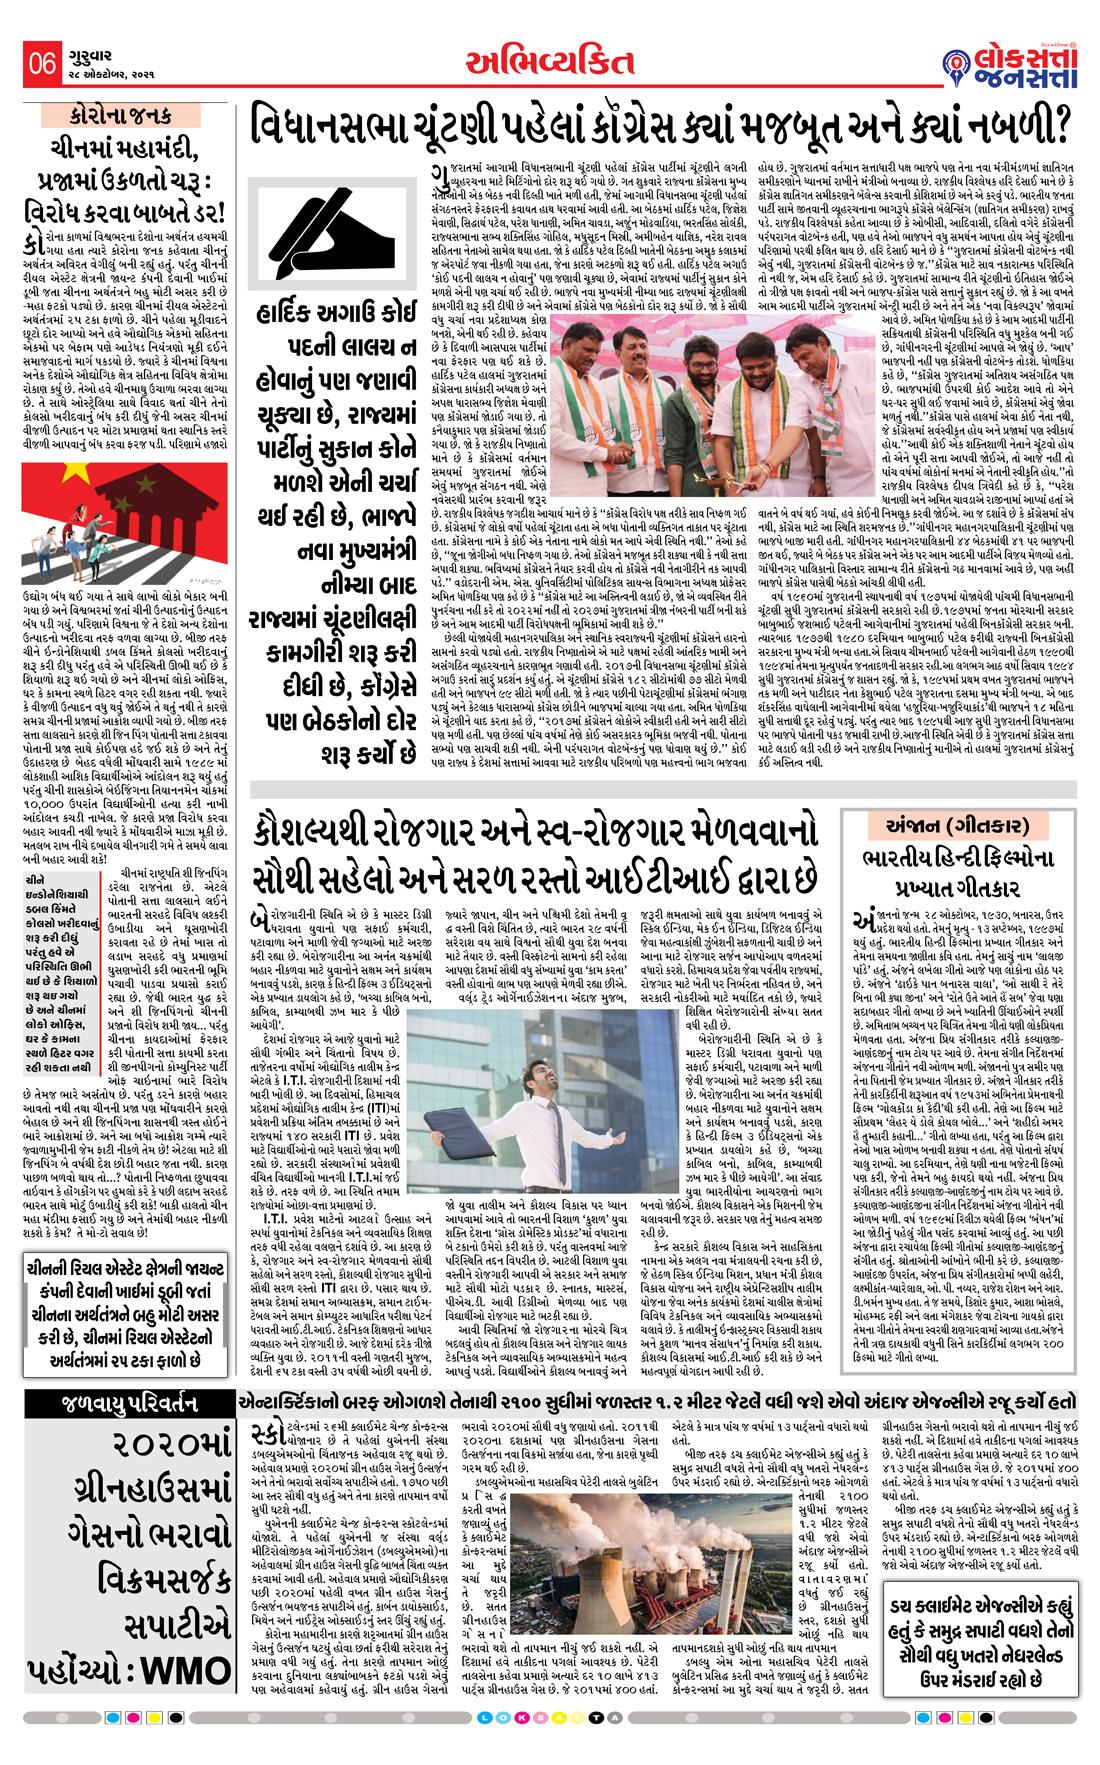 Loksatta Jansatta News Papaer E-paper dated 2021-10-28   Page 6